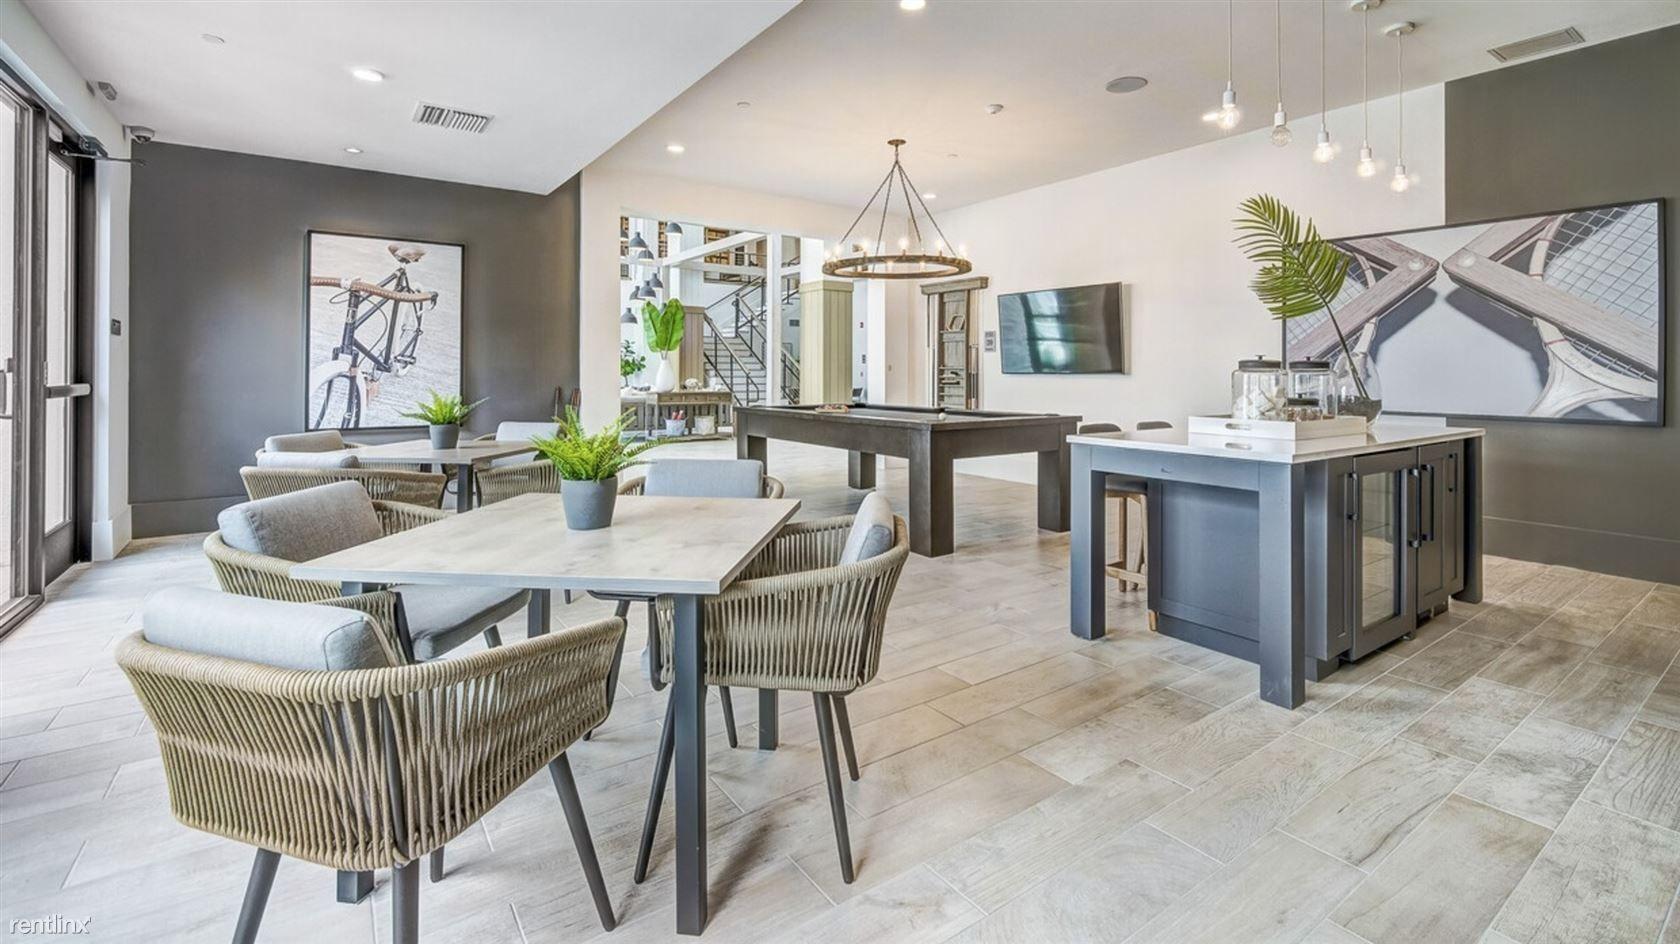 Landing Furnished Apartment Lake House by Alta rental